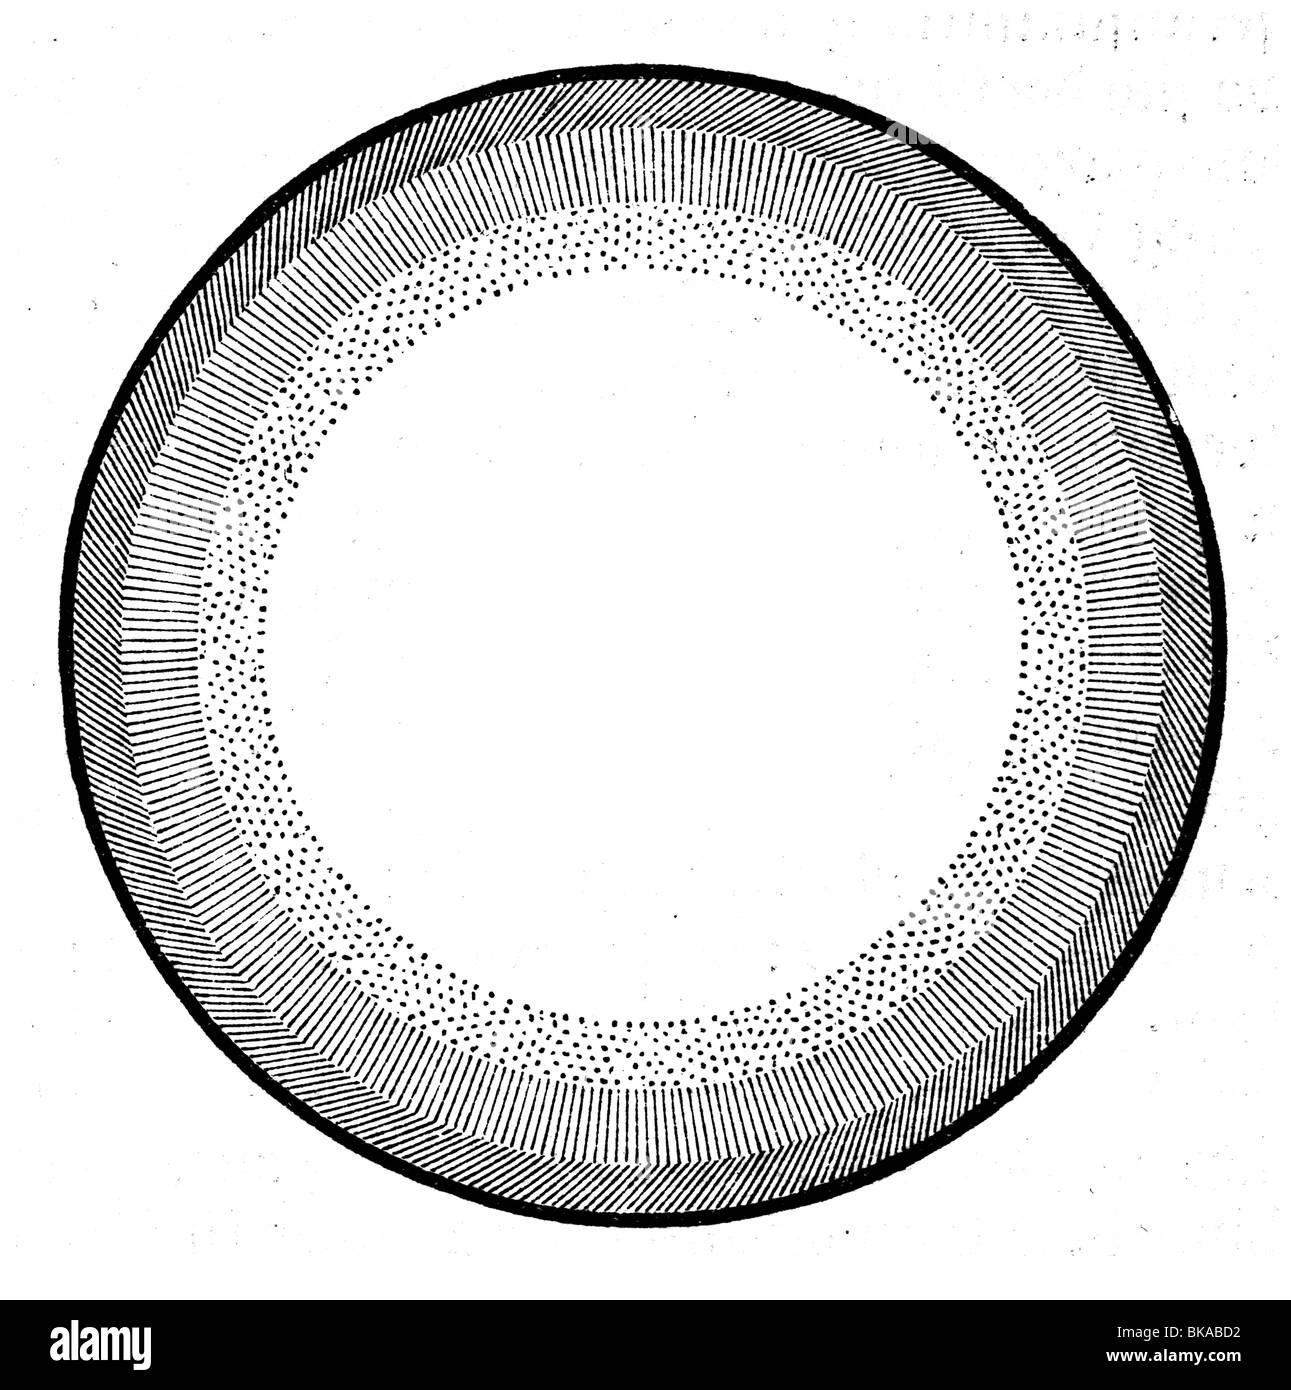 Schichten im Inneren der Erde Stockbild